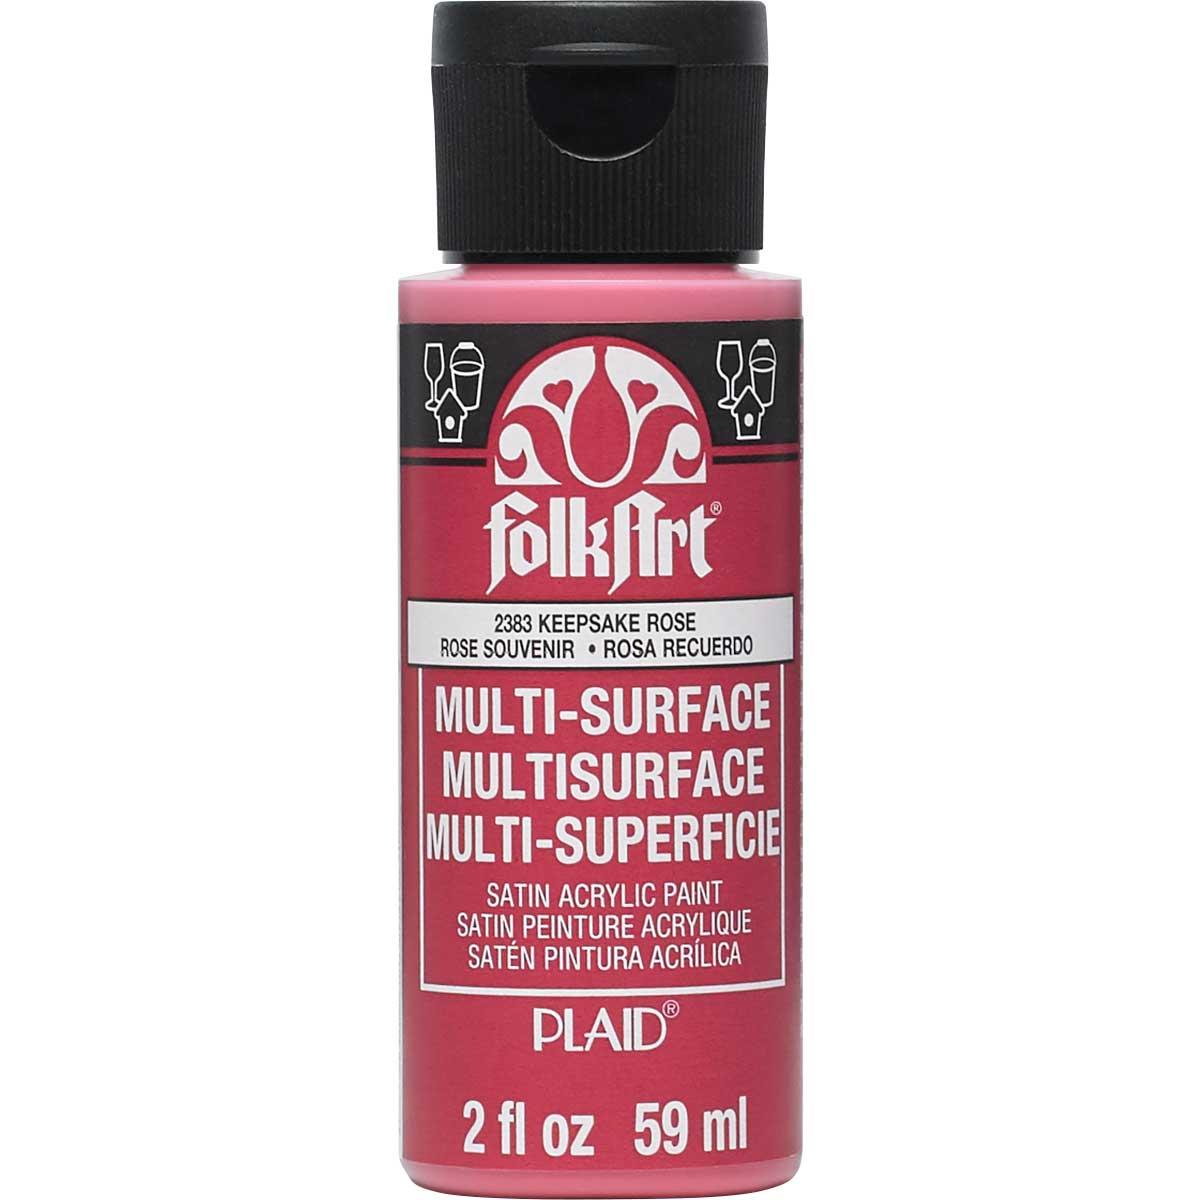 FolkArt ® Multi-Surface Satin Acrylic Paints - Keepsake Rose, 2 oz. - 2383